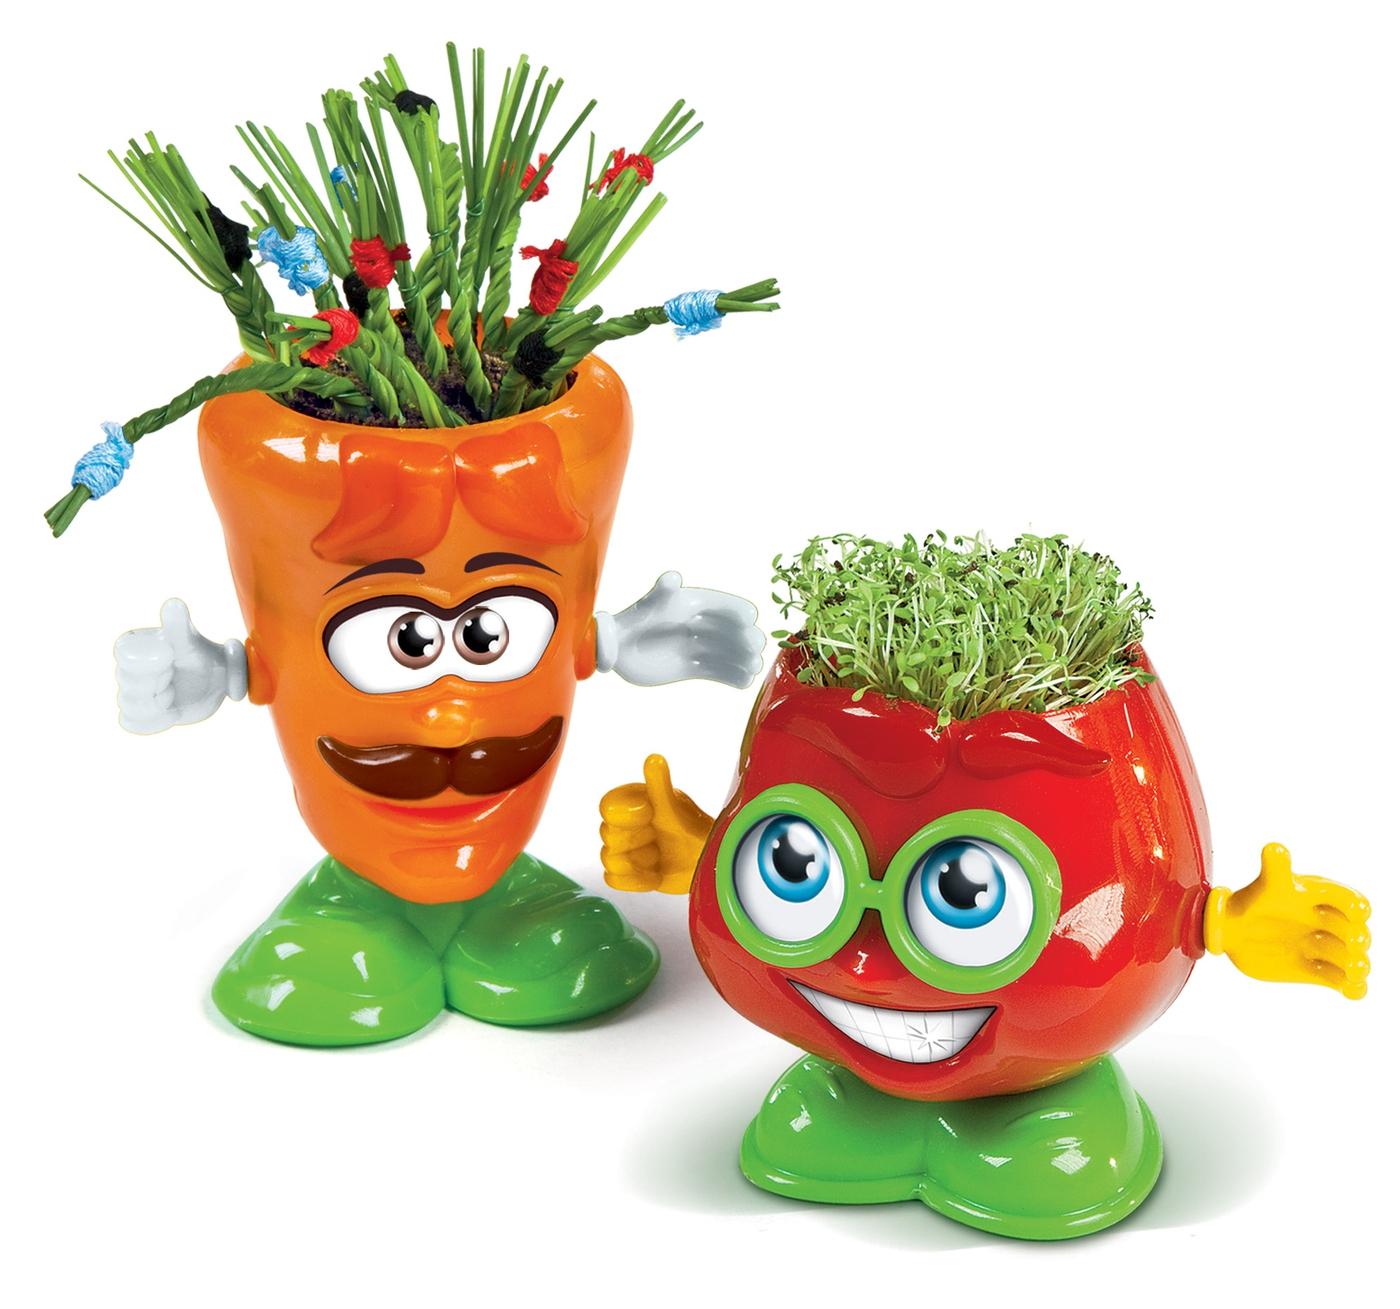 Jardin Potager - Clementoni concernant Jardin En Pots Potager